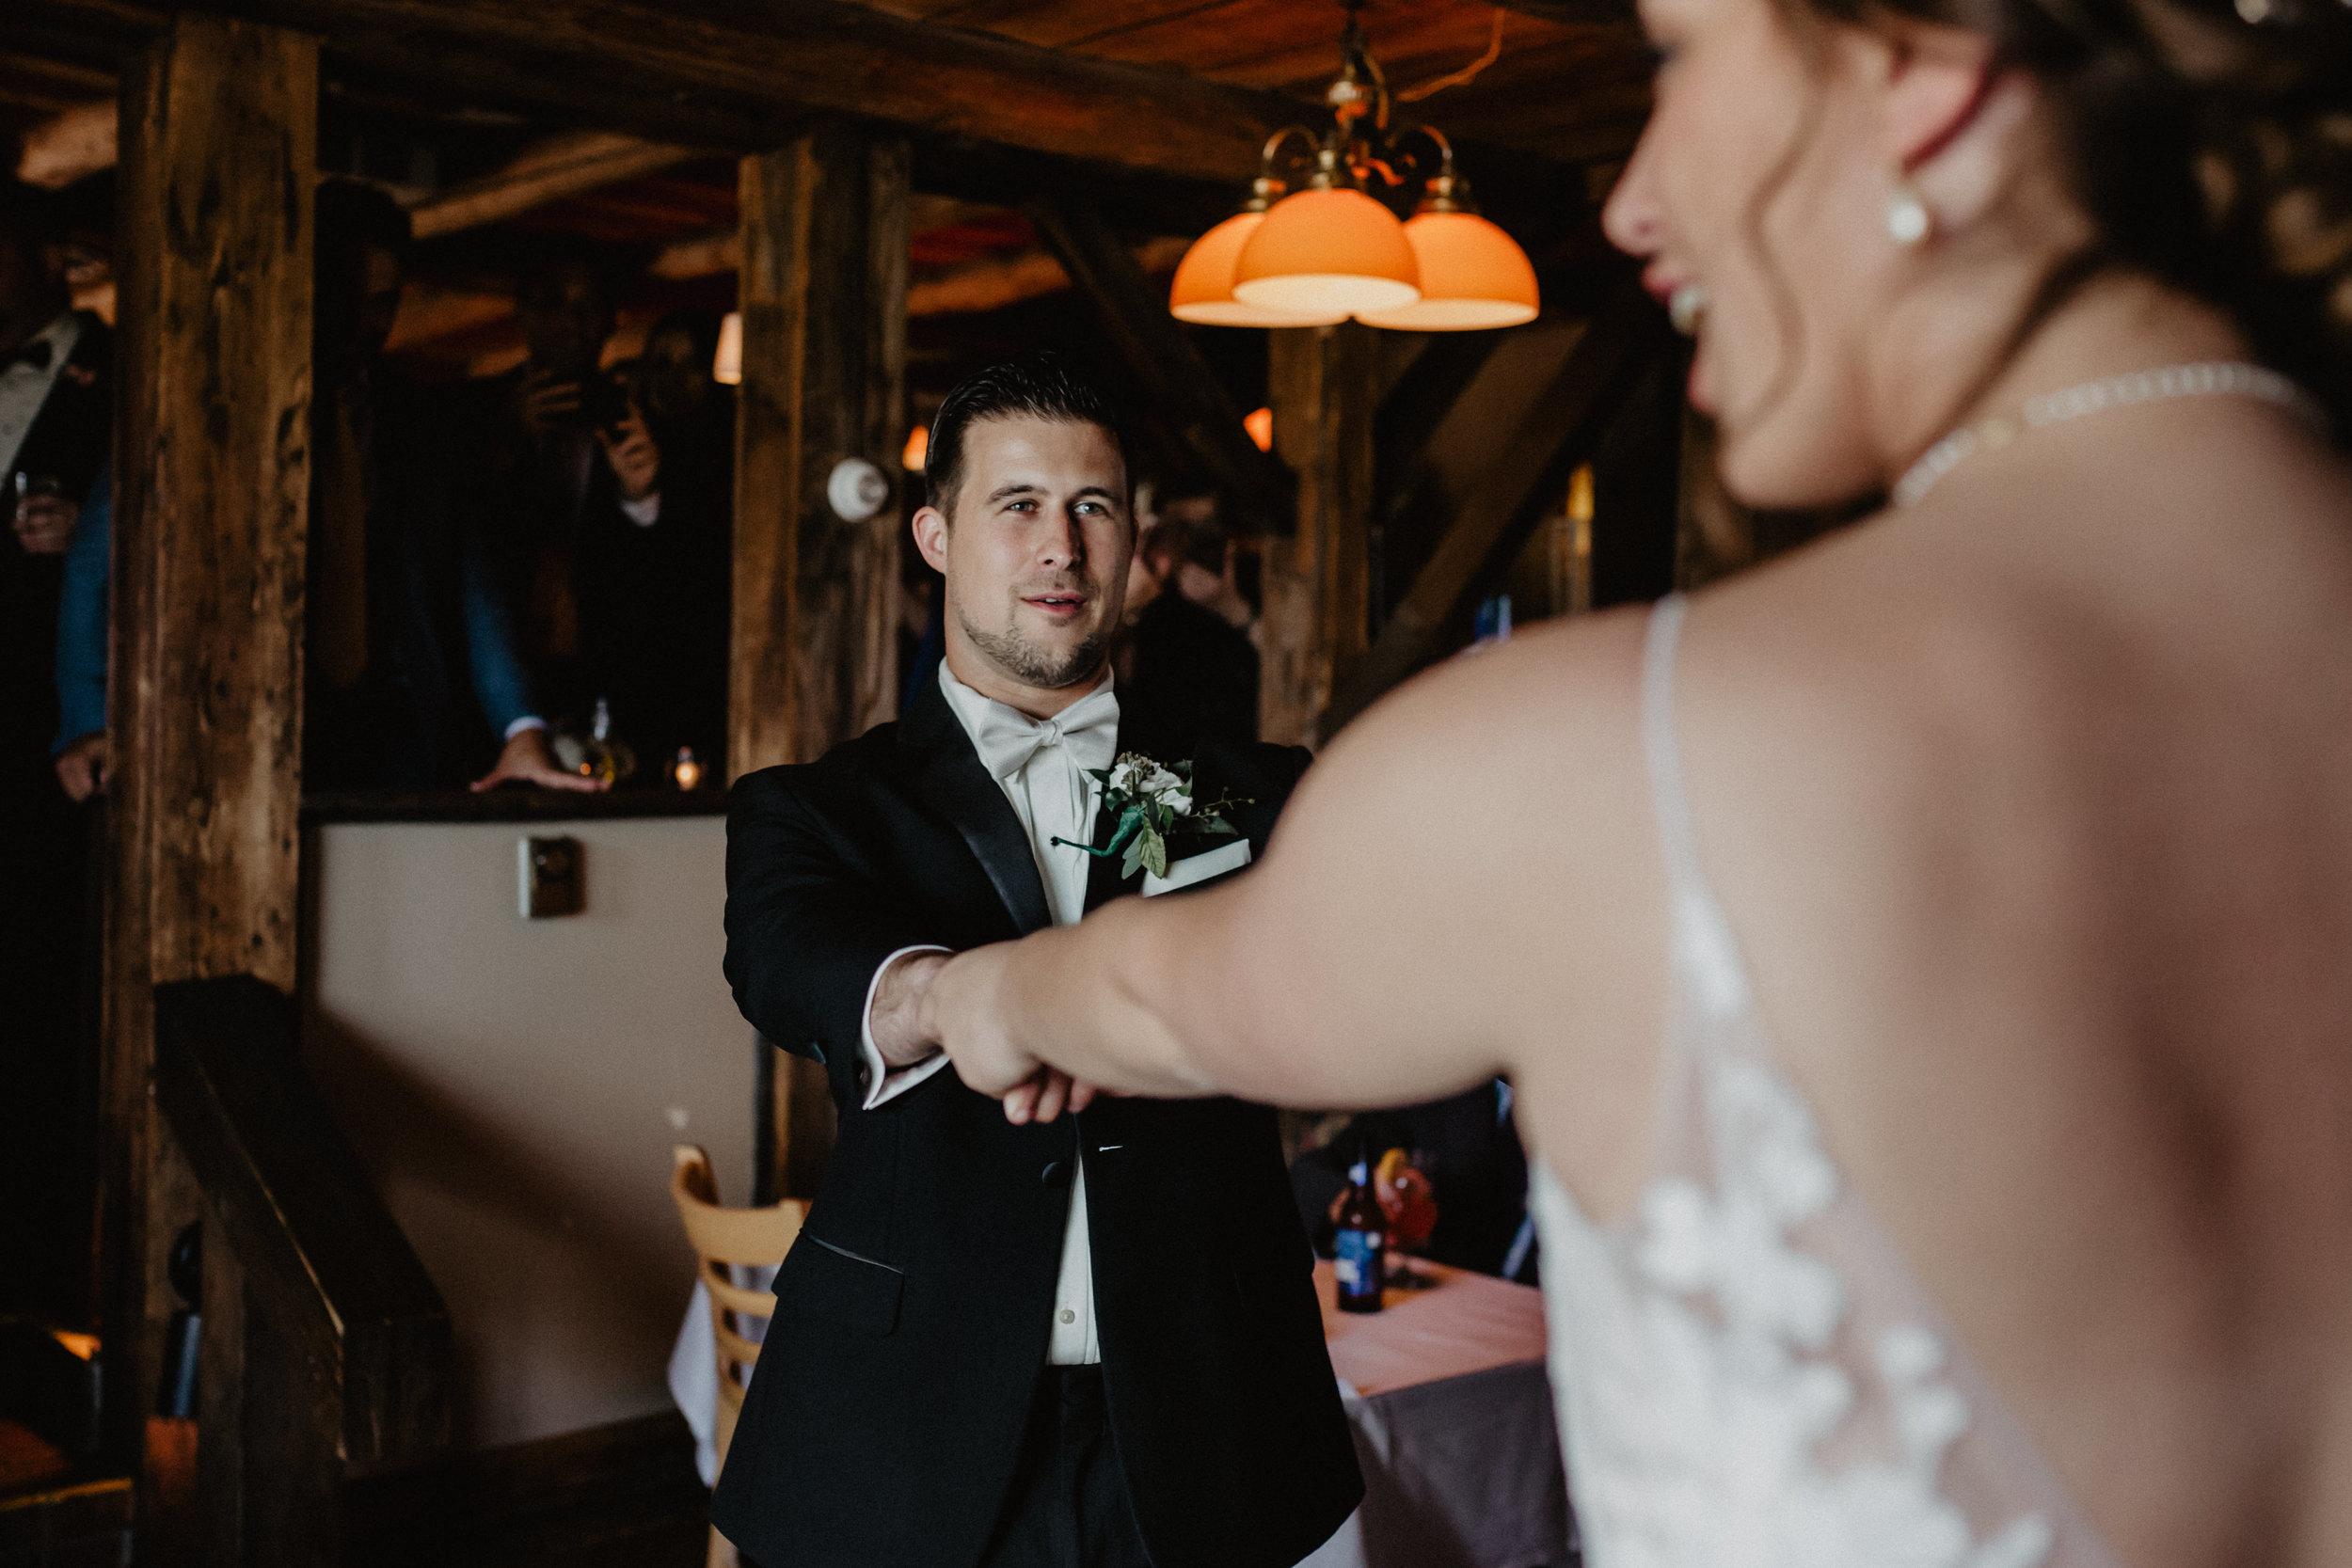 upstate_ny_wedding-43.jpg